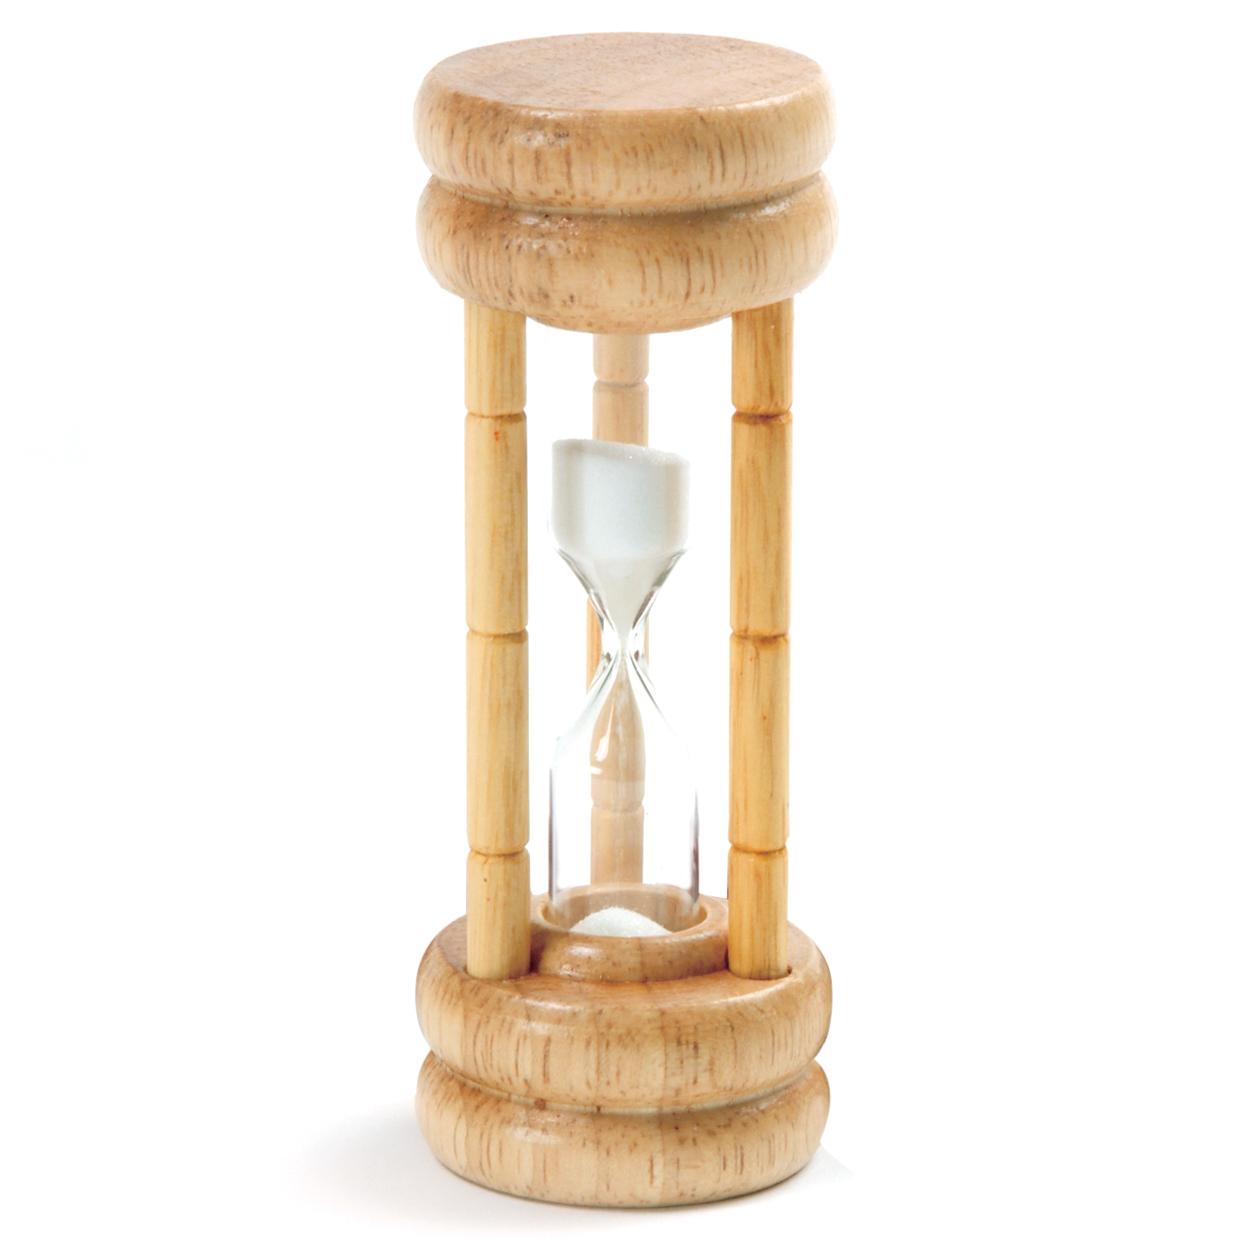 Temporizador de madera.